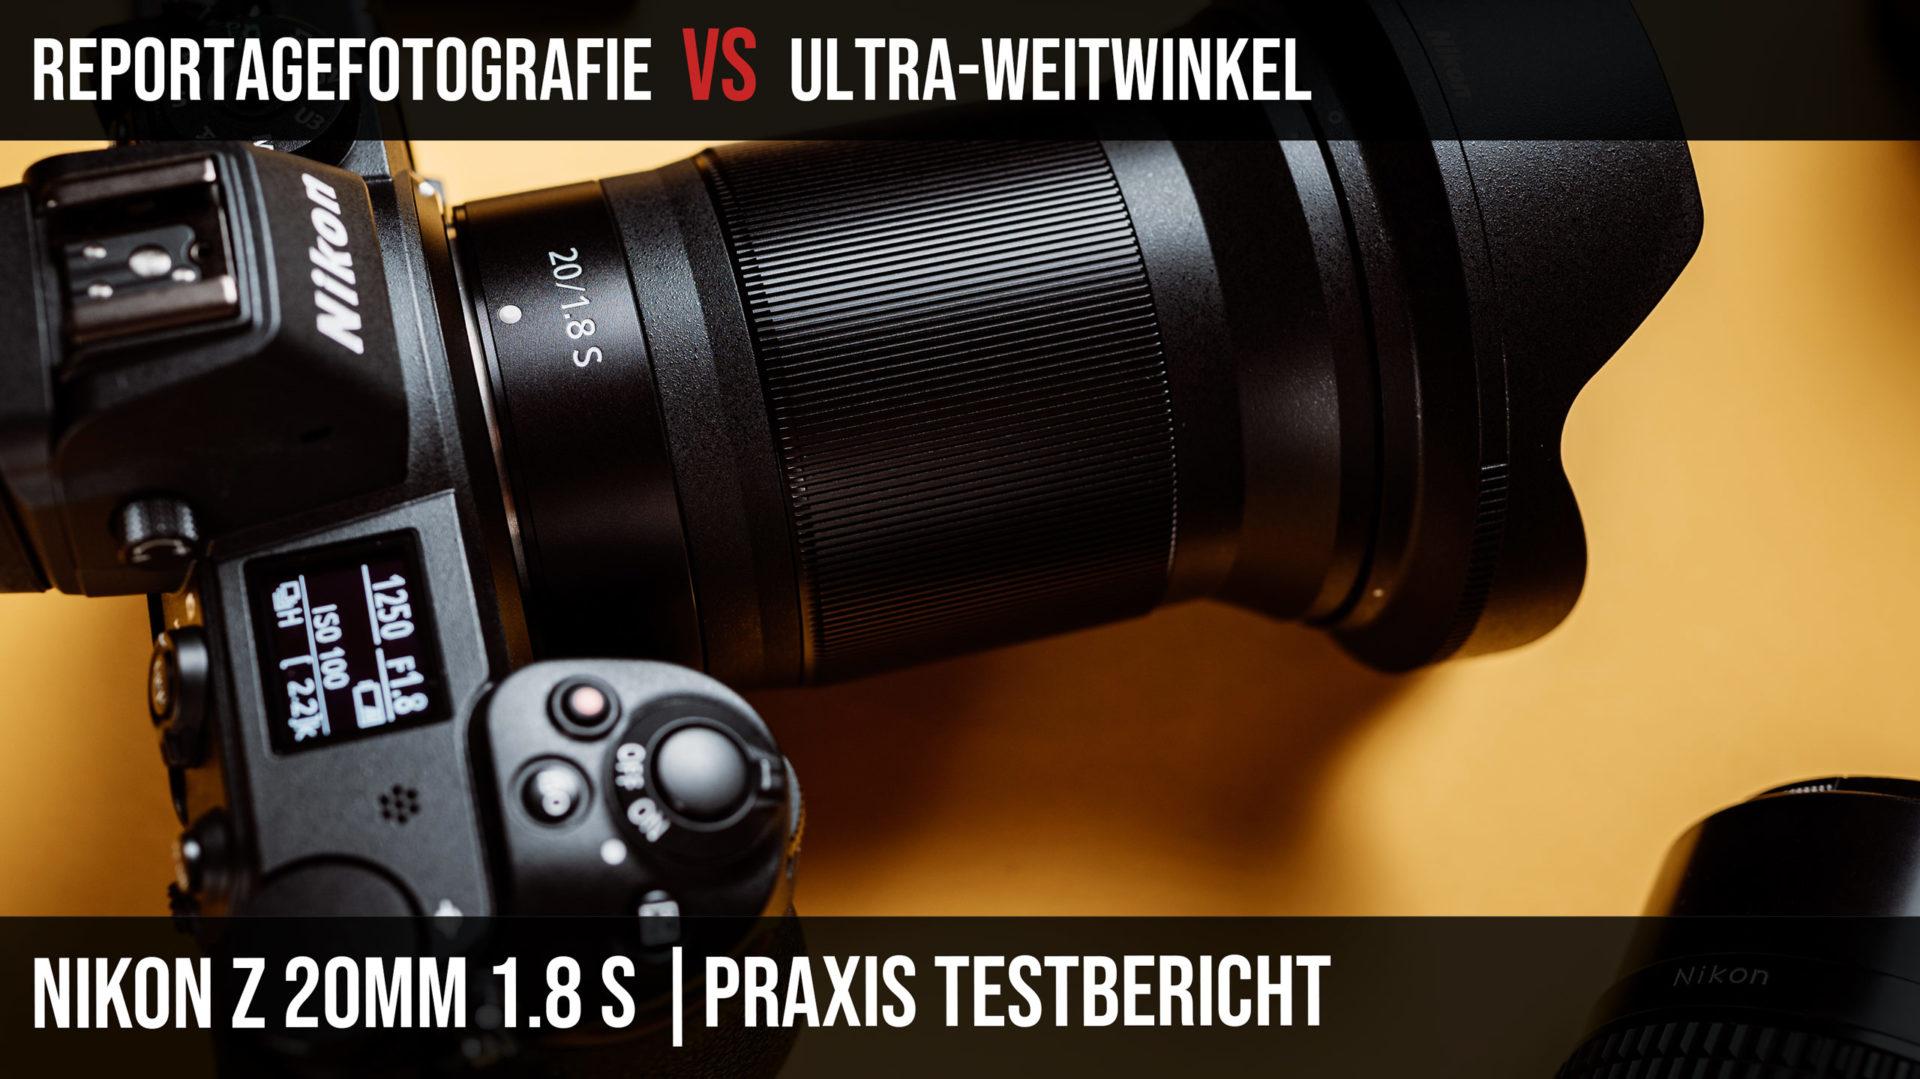 Nikon Z 20mm 1.8 S Test Review Praxis Erfahrungen Testbericht Lichtrebell